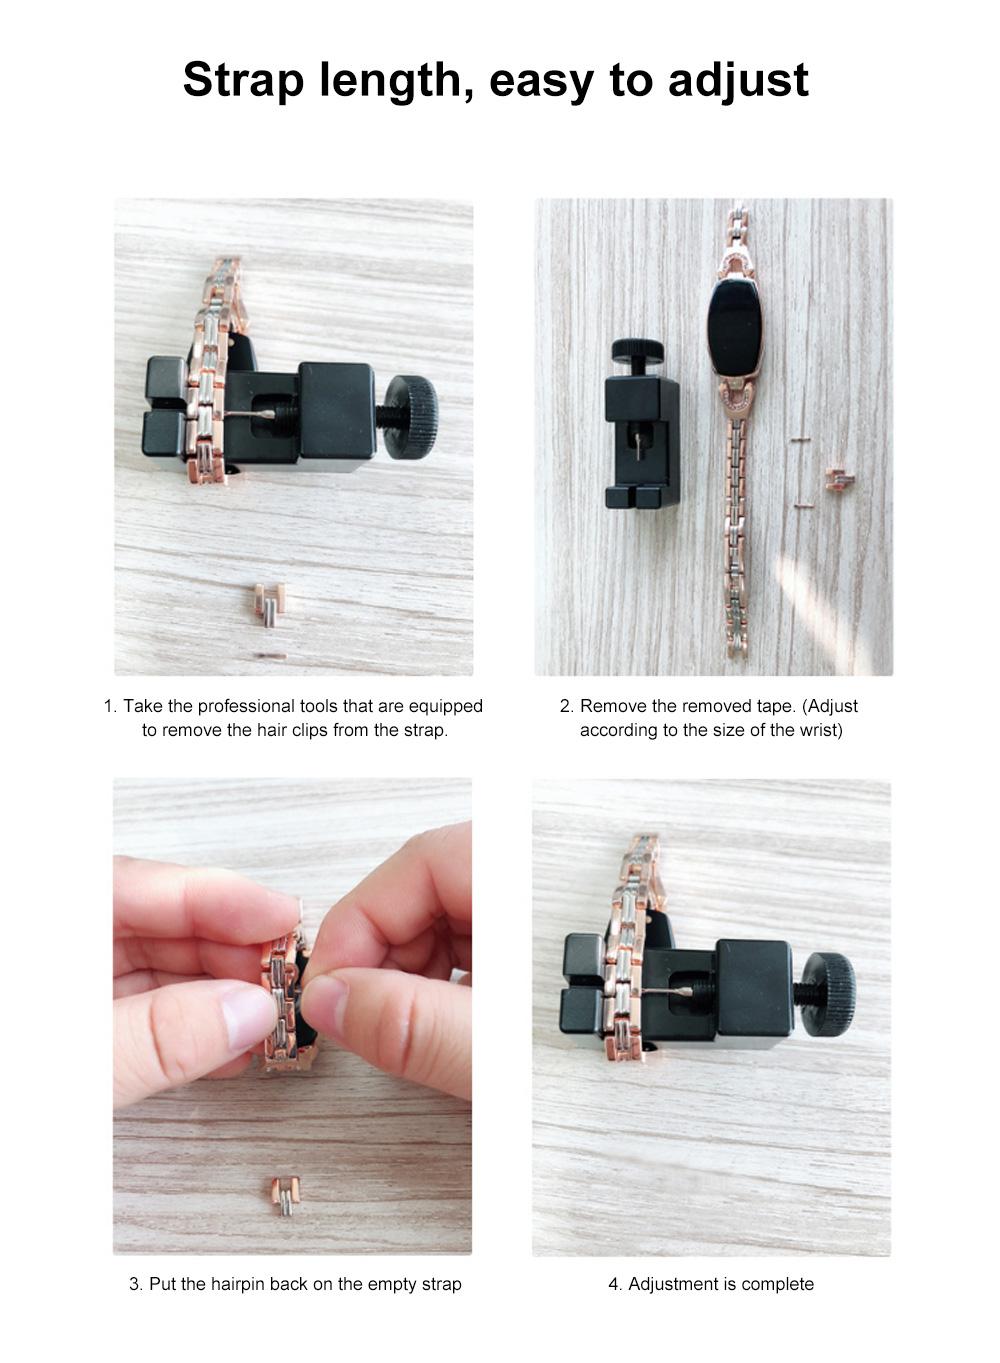 2019 Women Lady Fashion Smart Wristband H8 Heart Rate Blood Pressure Smart Bracelet Fitness Tracker Smart Watch Band Female Girl Gift 14